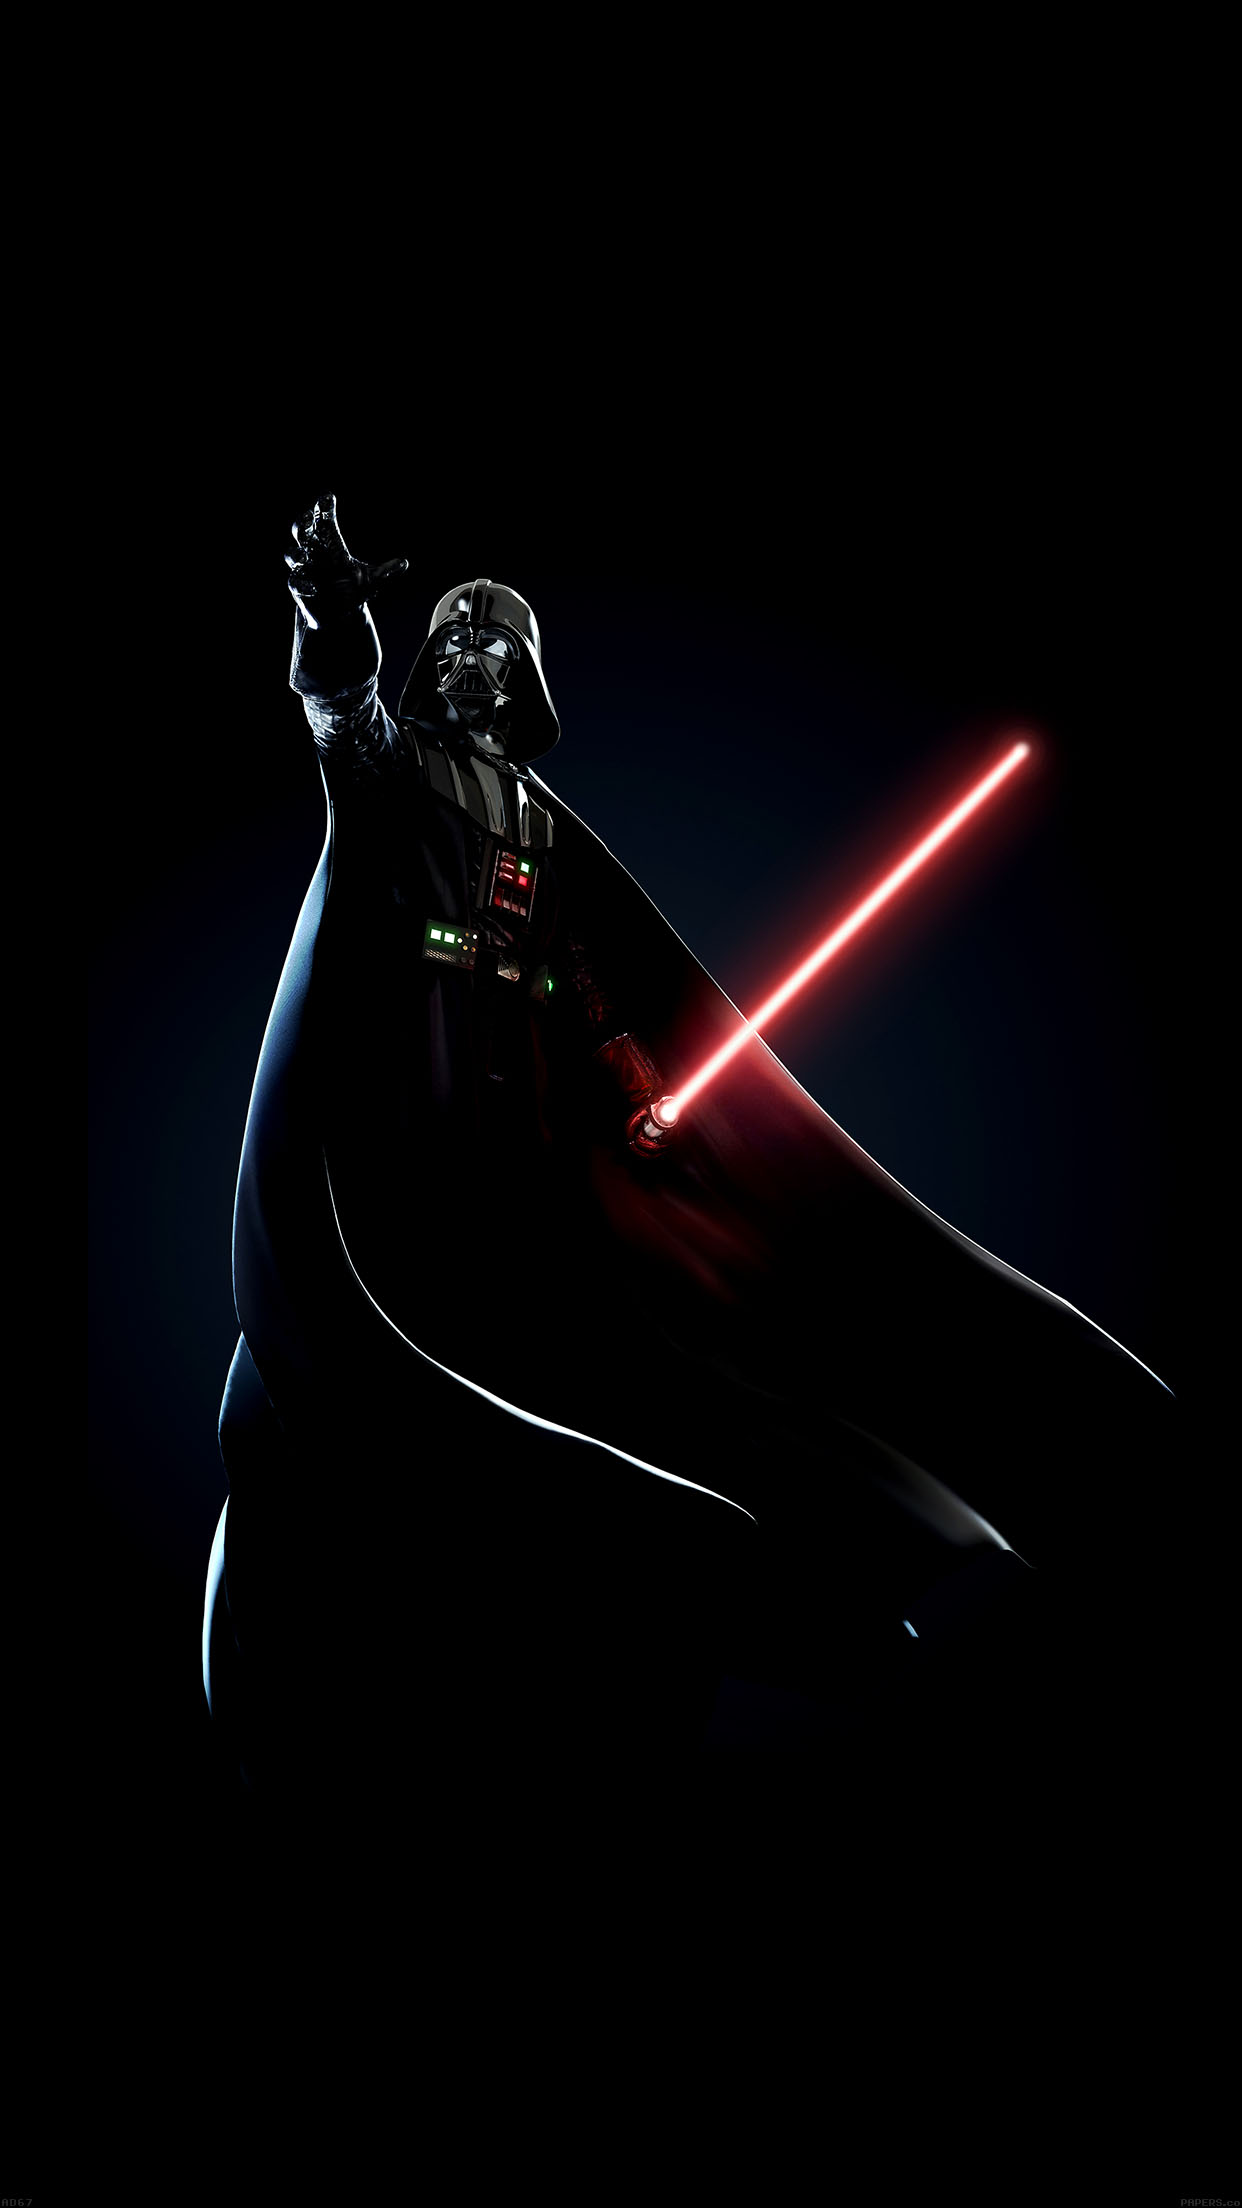 Darth Vader Iphone 7 Wallpaper Hd Babangrichie Org